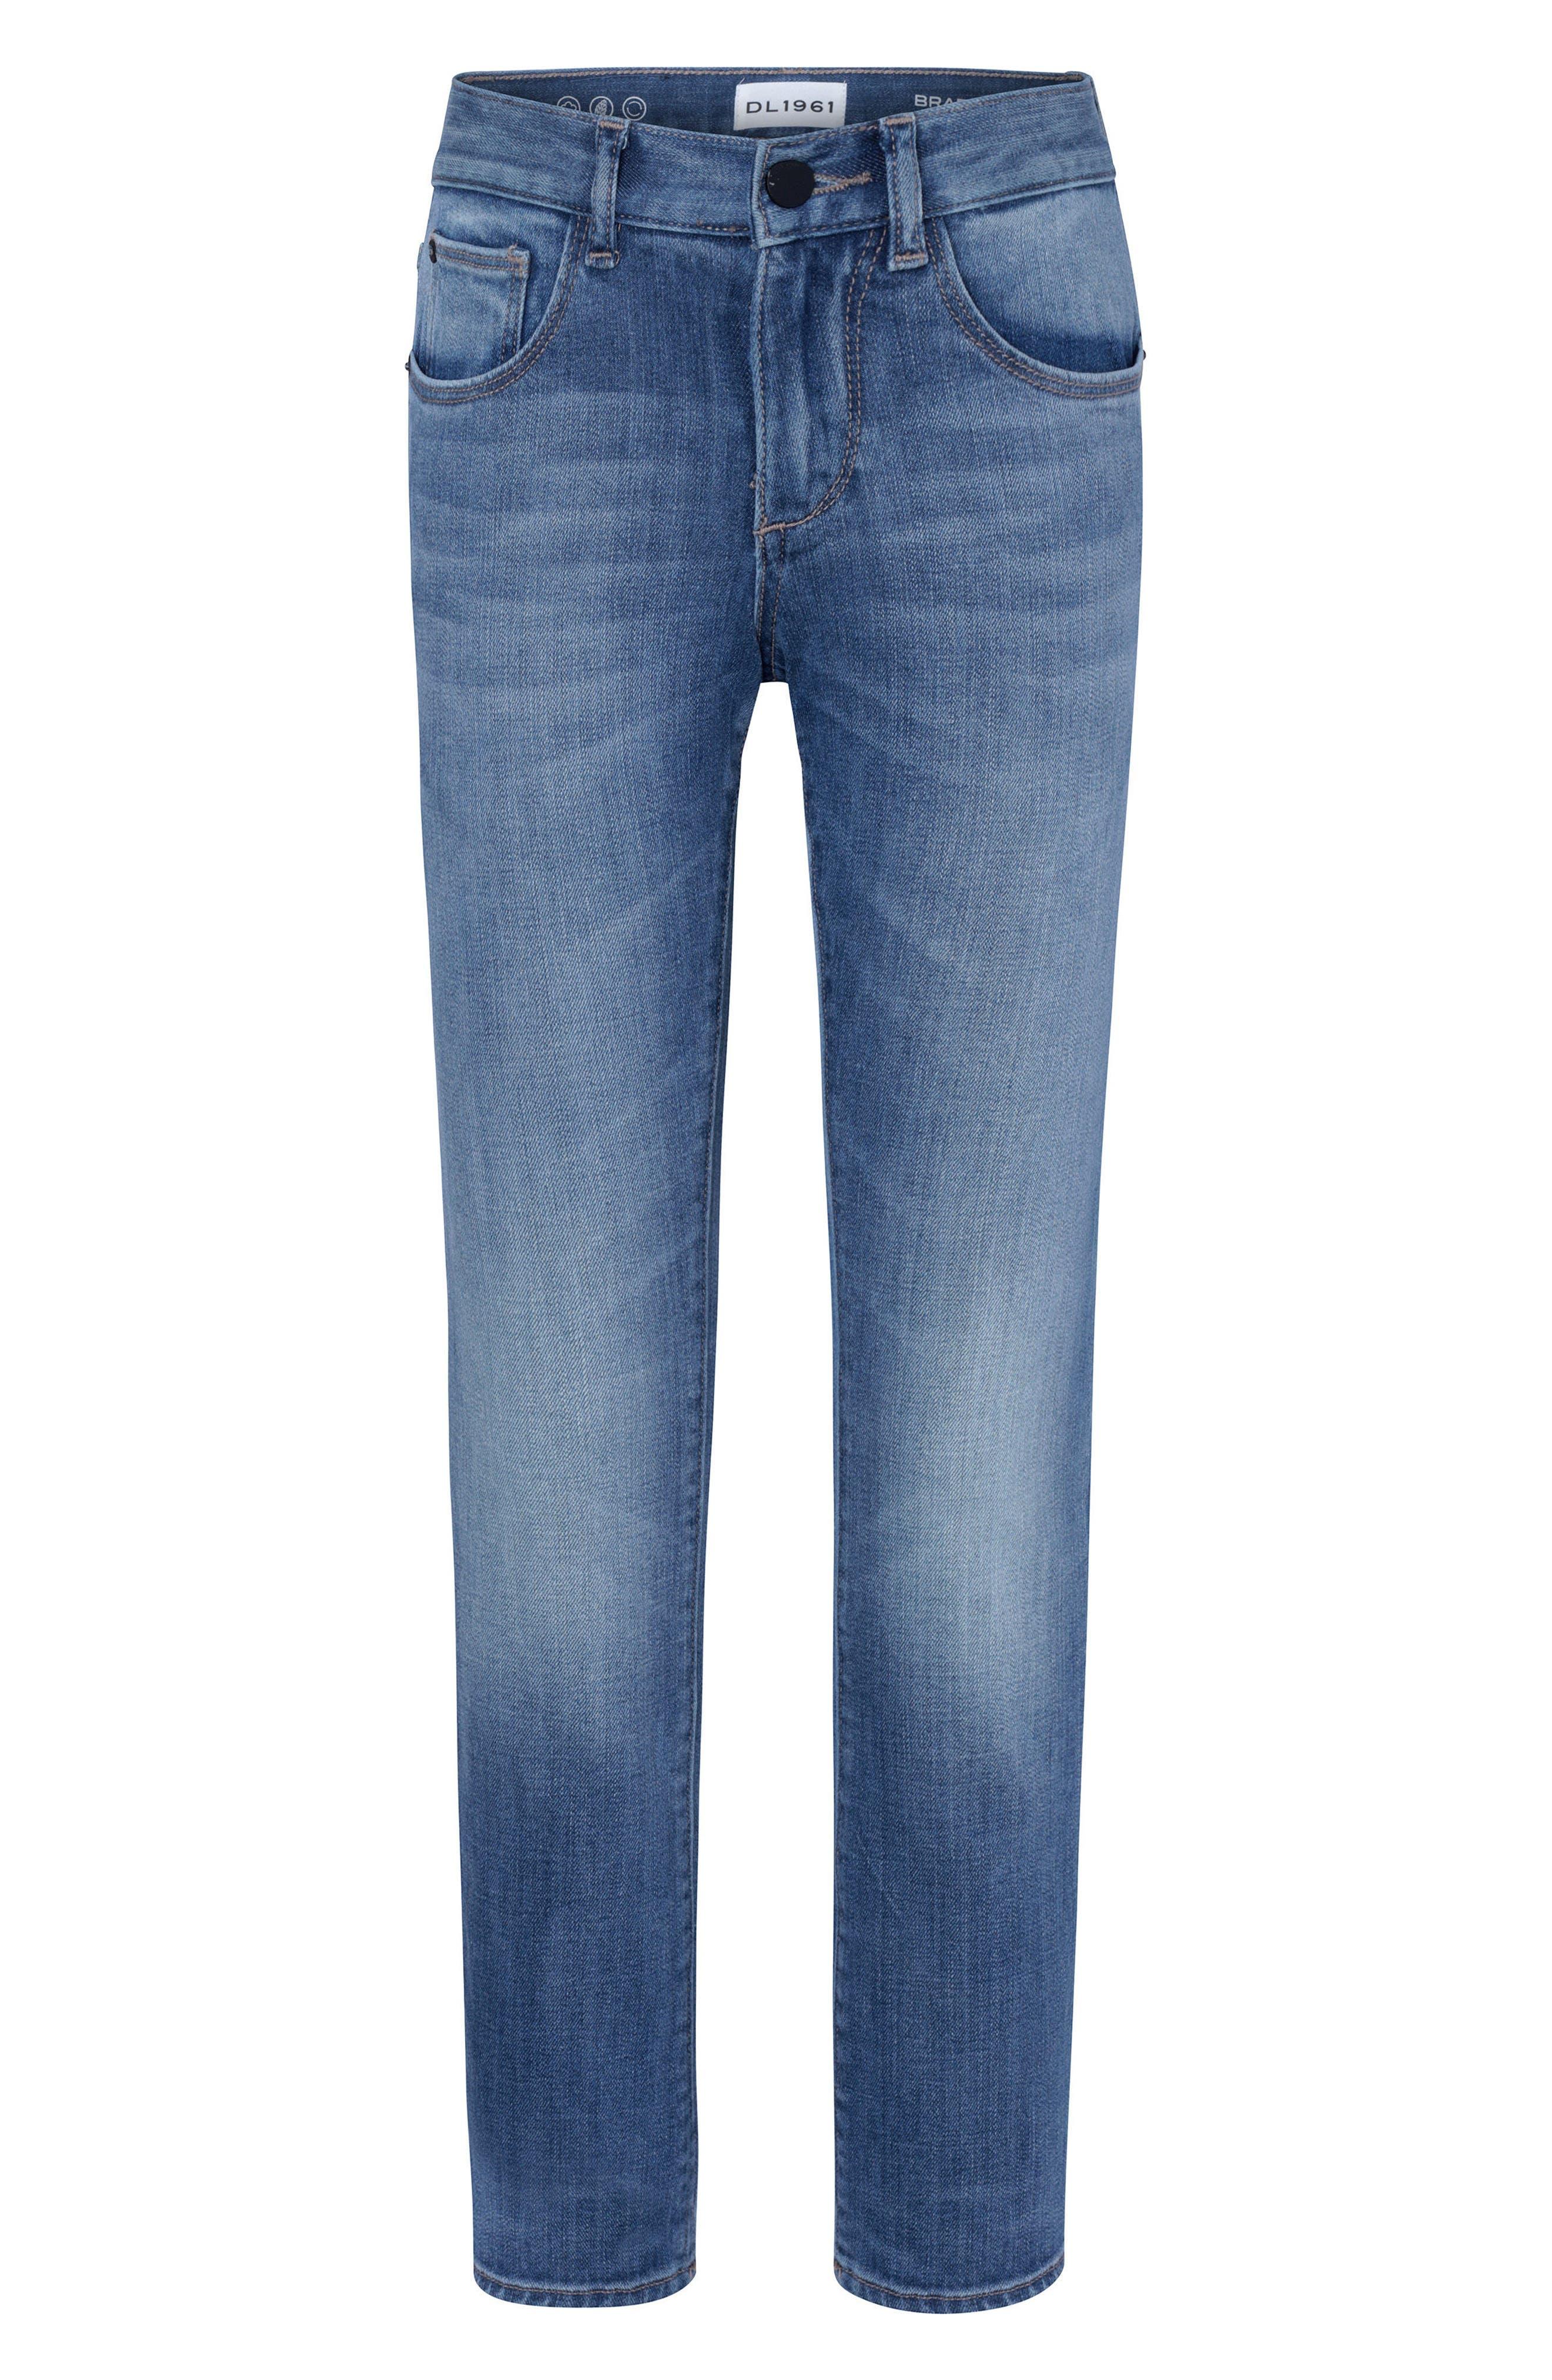 Brady Slim Fit Jeans,                             Main thumbnail 1, color,                             FRESH